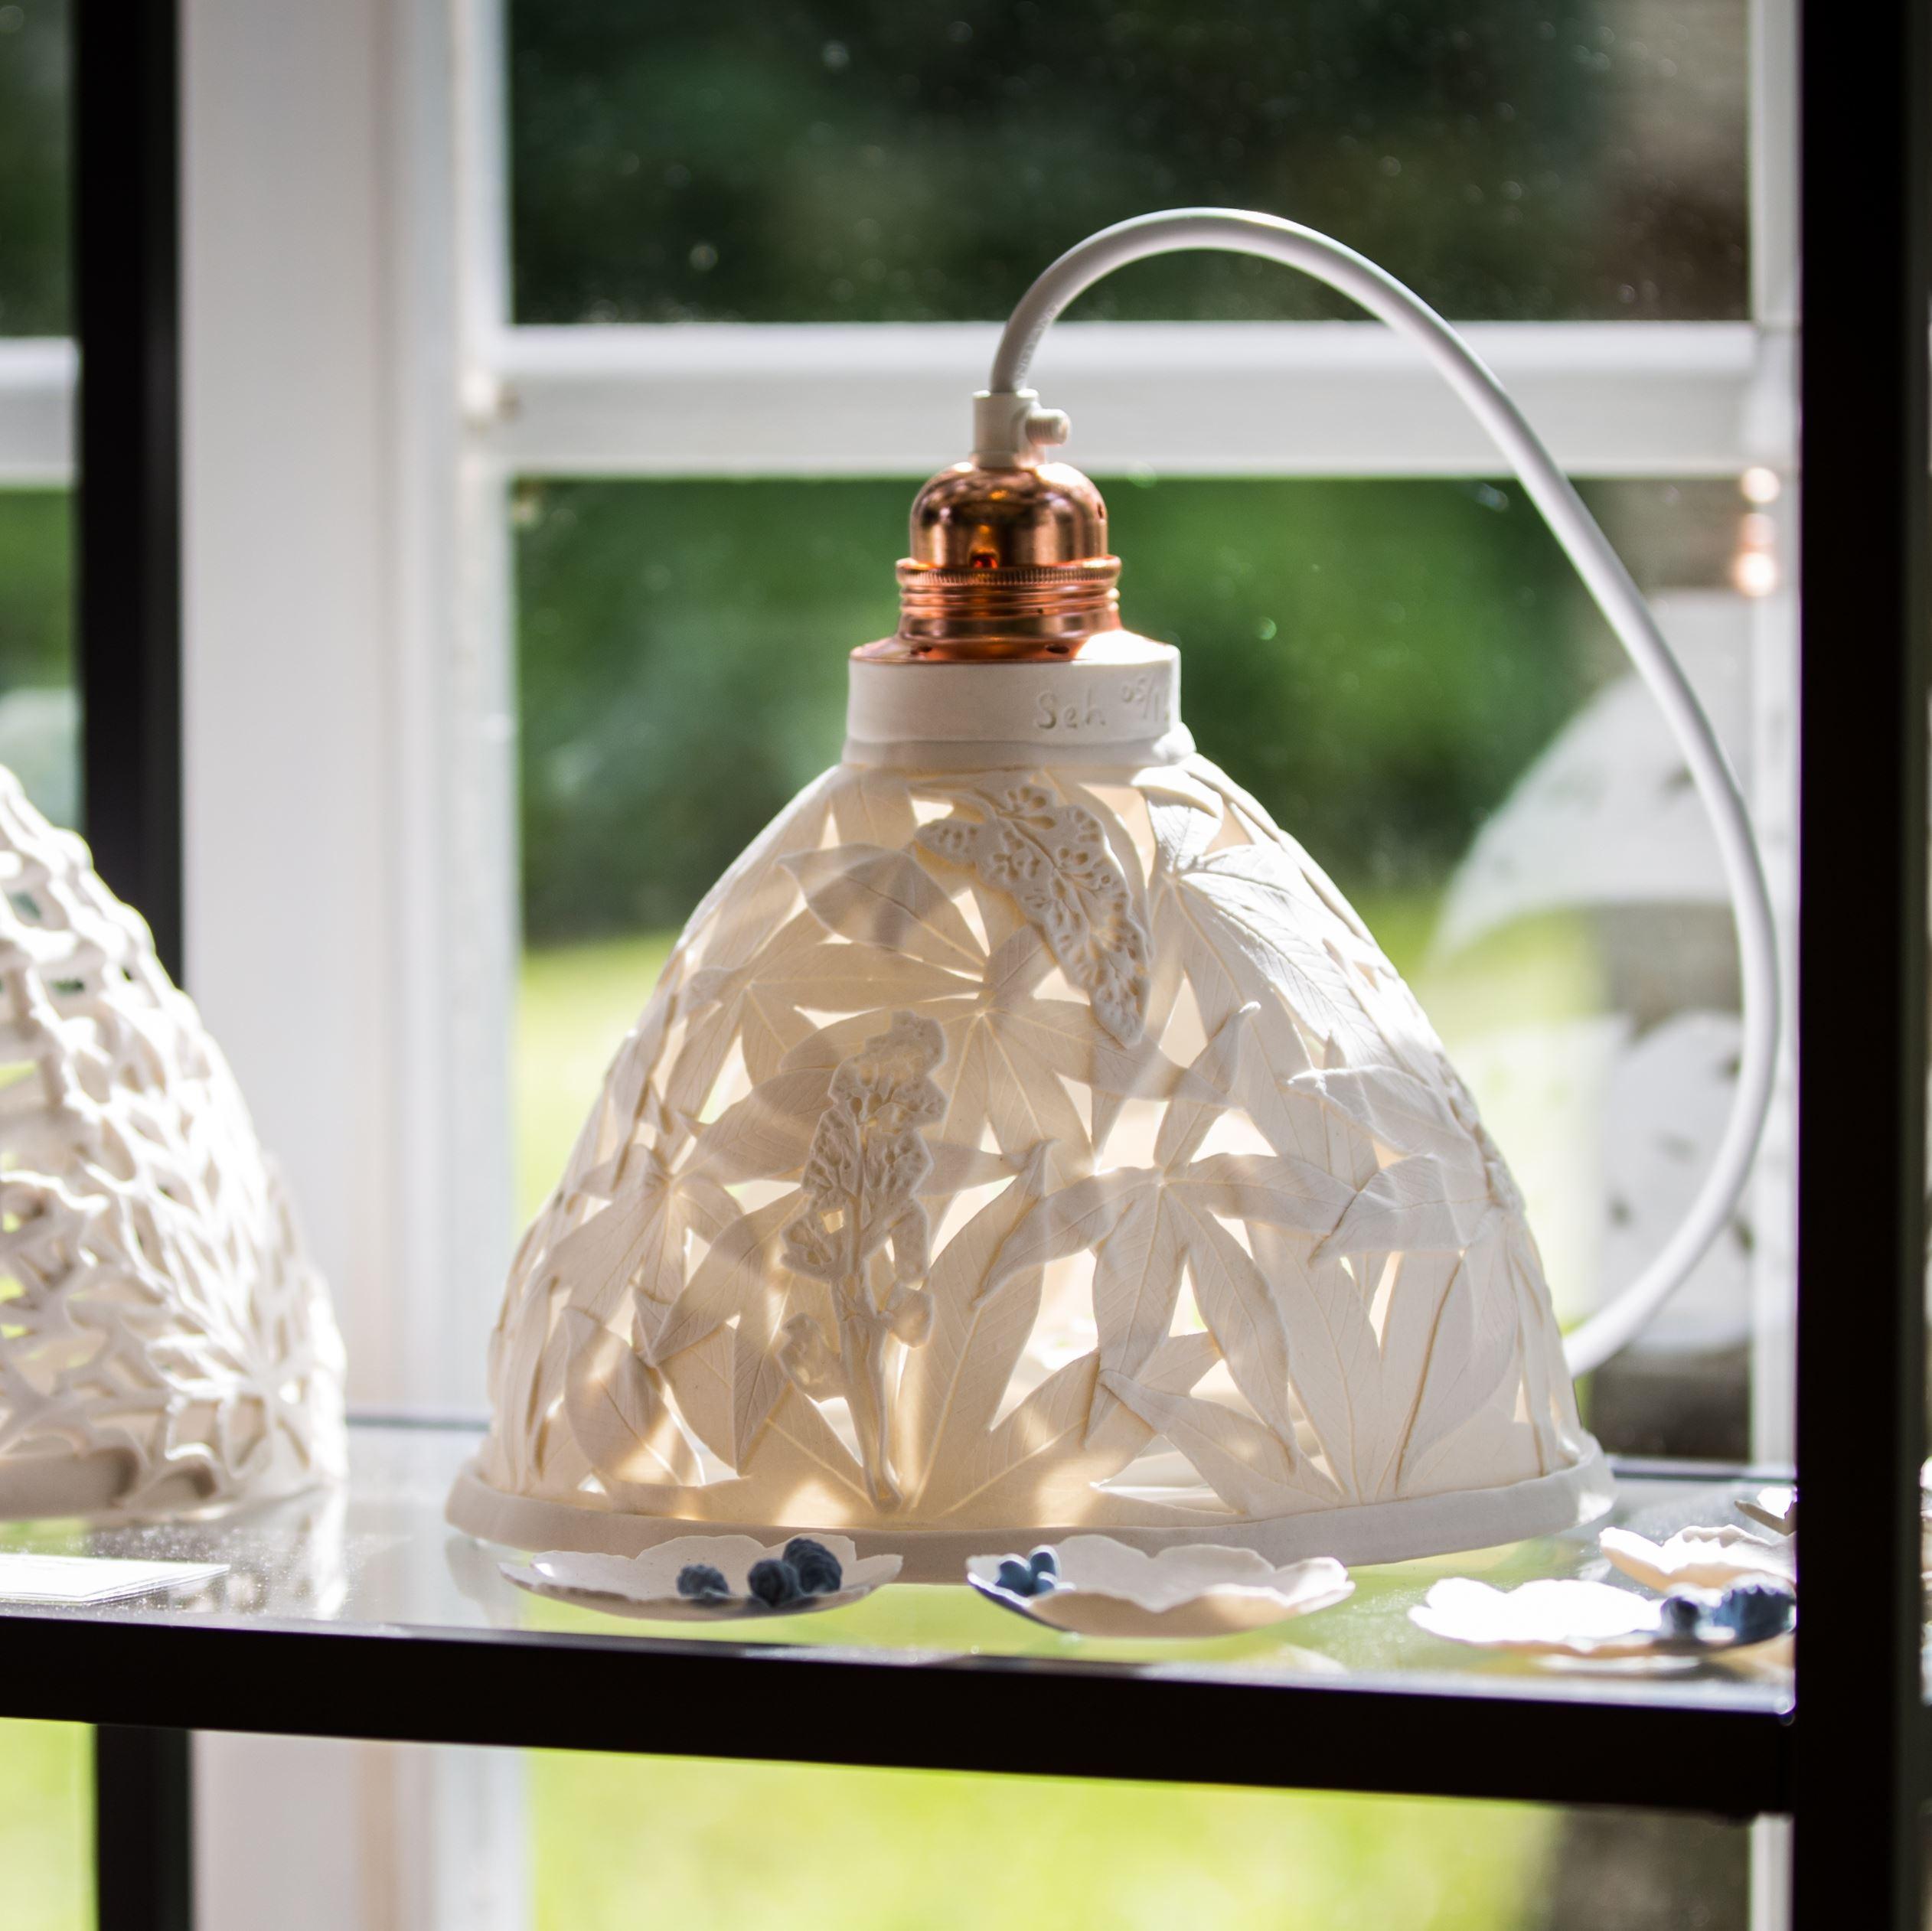 Sommer bei Sehler Keramik